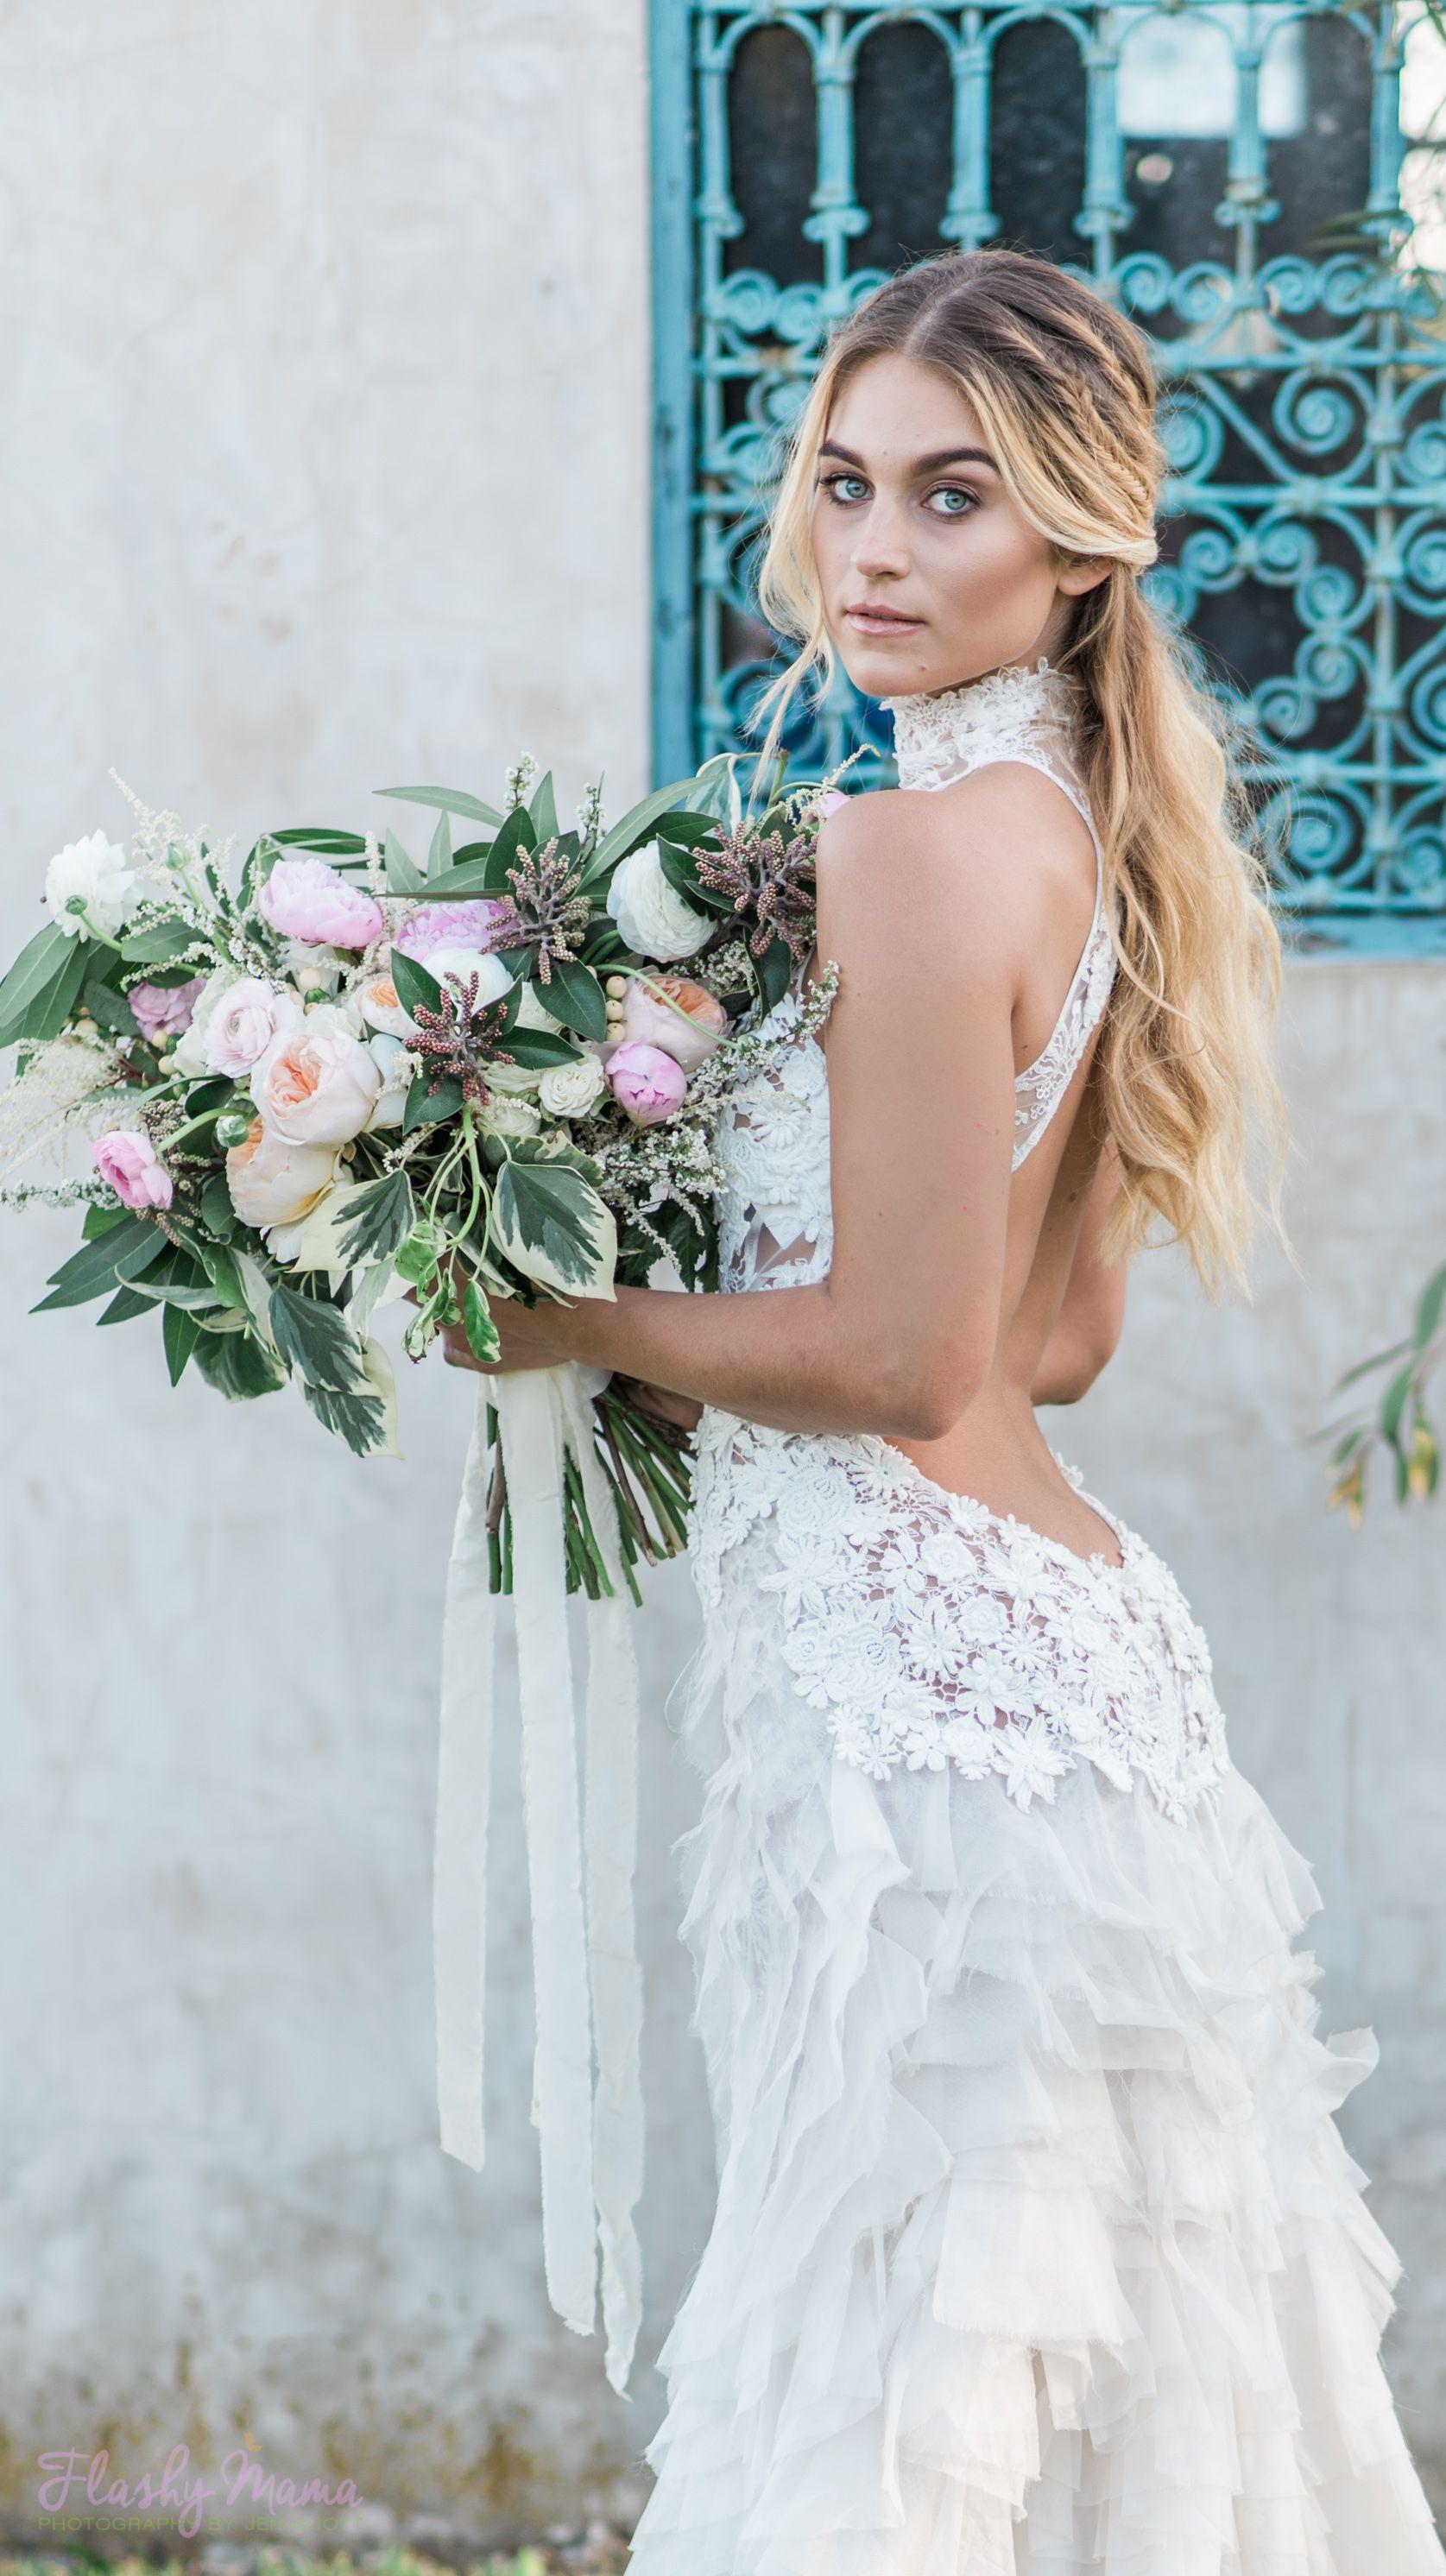 Tolle Flashy Wedding Dresses Ideen - Brautkleider Ideen - bodmaslive.com